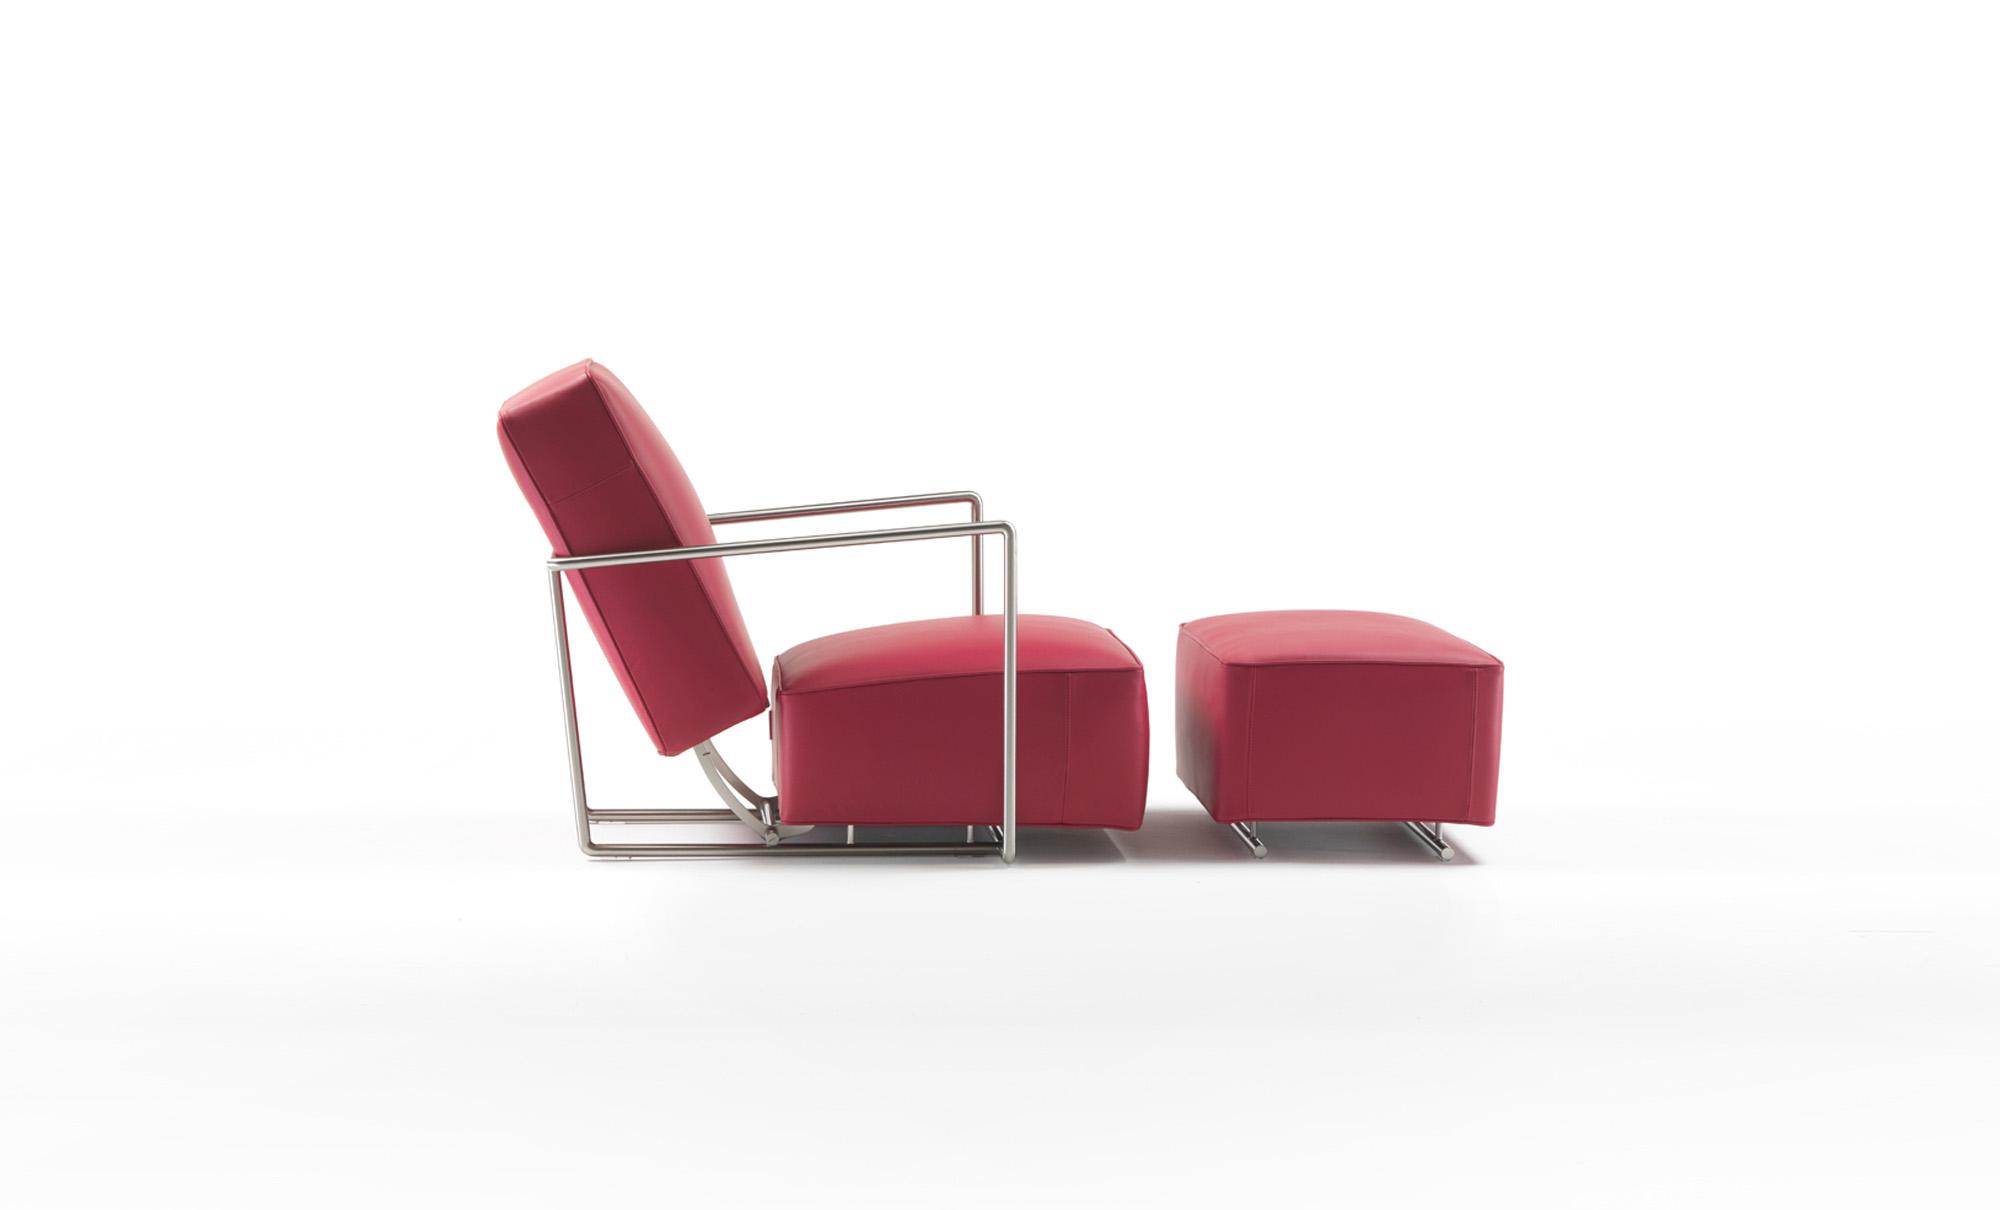 Chairs Fanuli Abc Abc Lounge Lounge Furniture Furniture Chairs Chairs Abc Lounge Fanuli sdthrBQxC